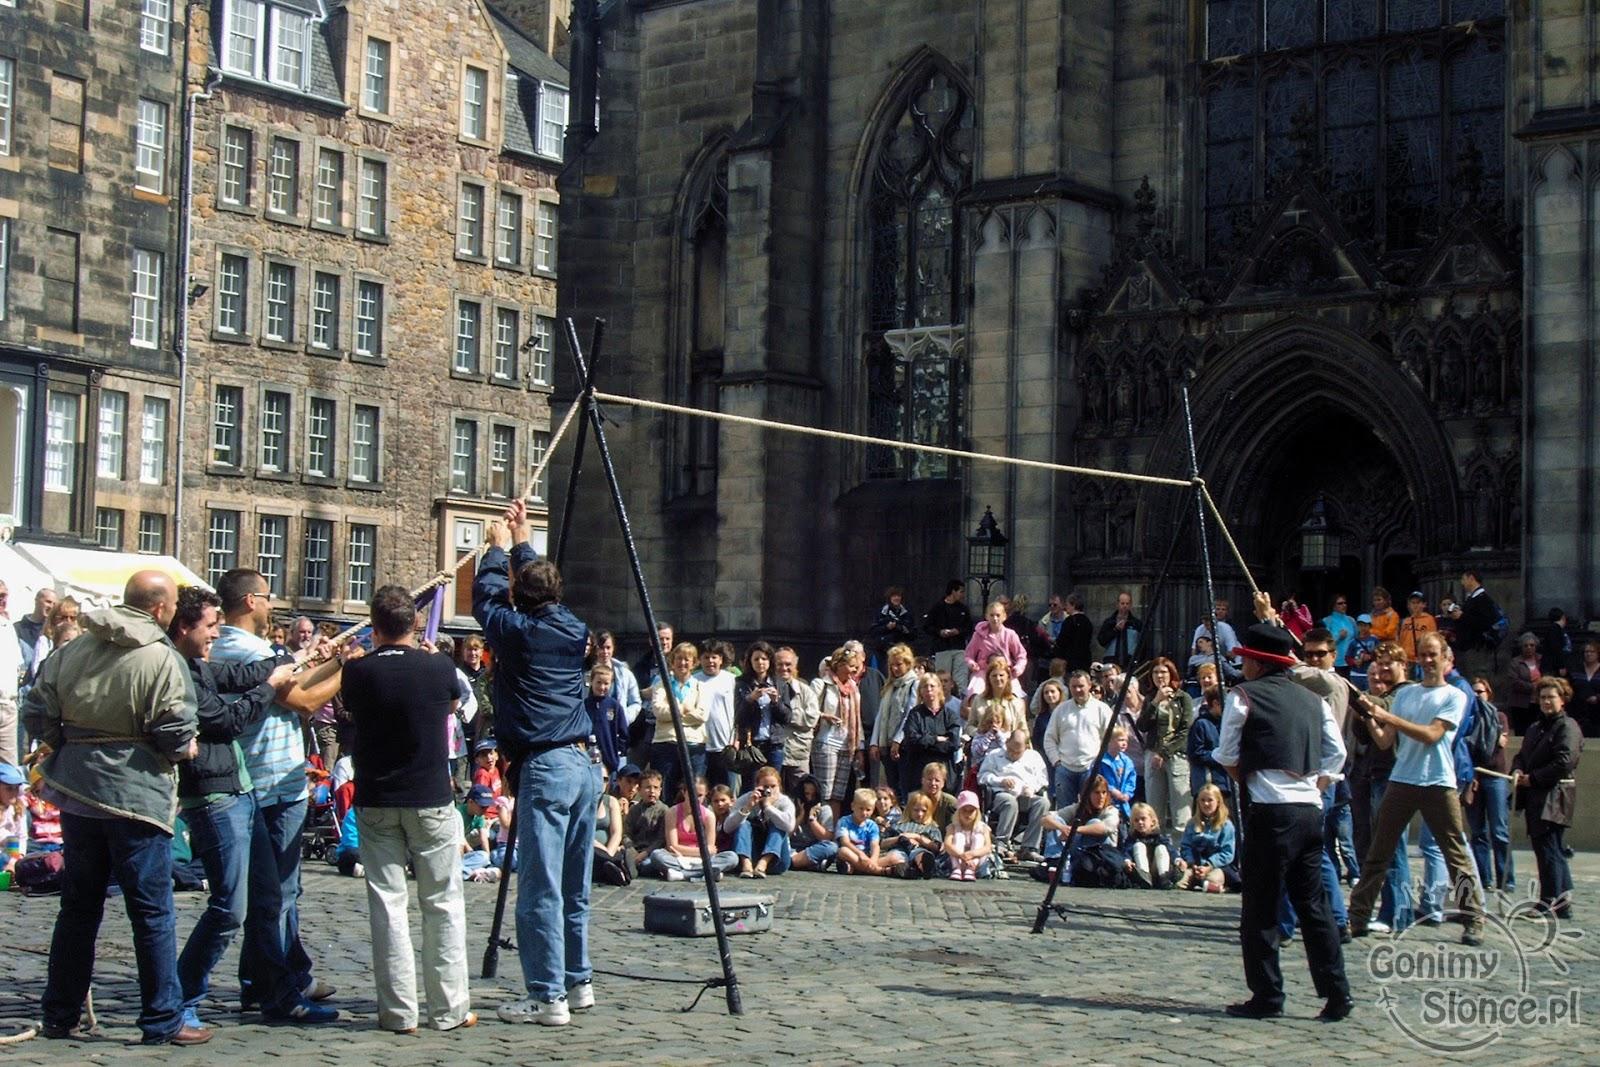 Zabawy festiwalowe na ulicach Edynburga